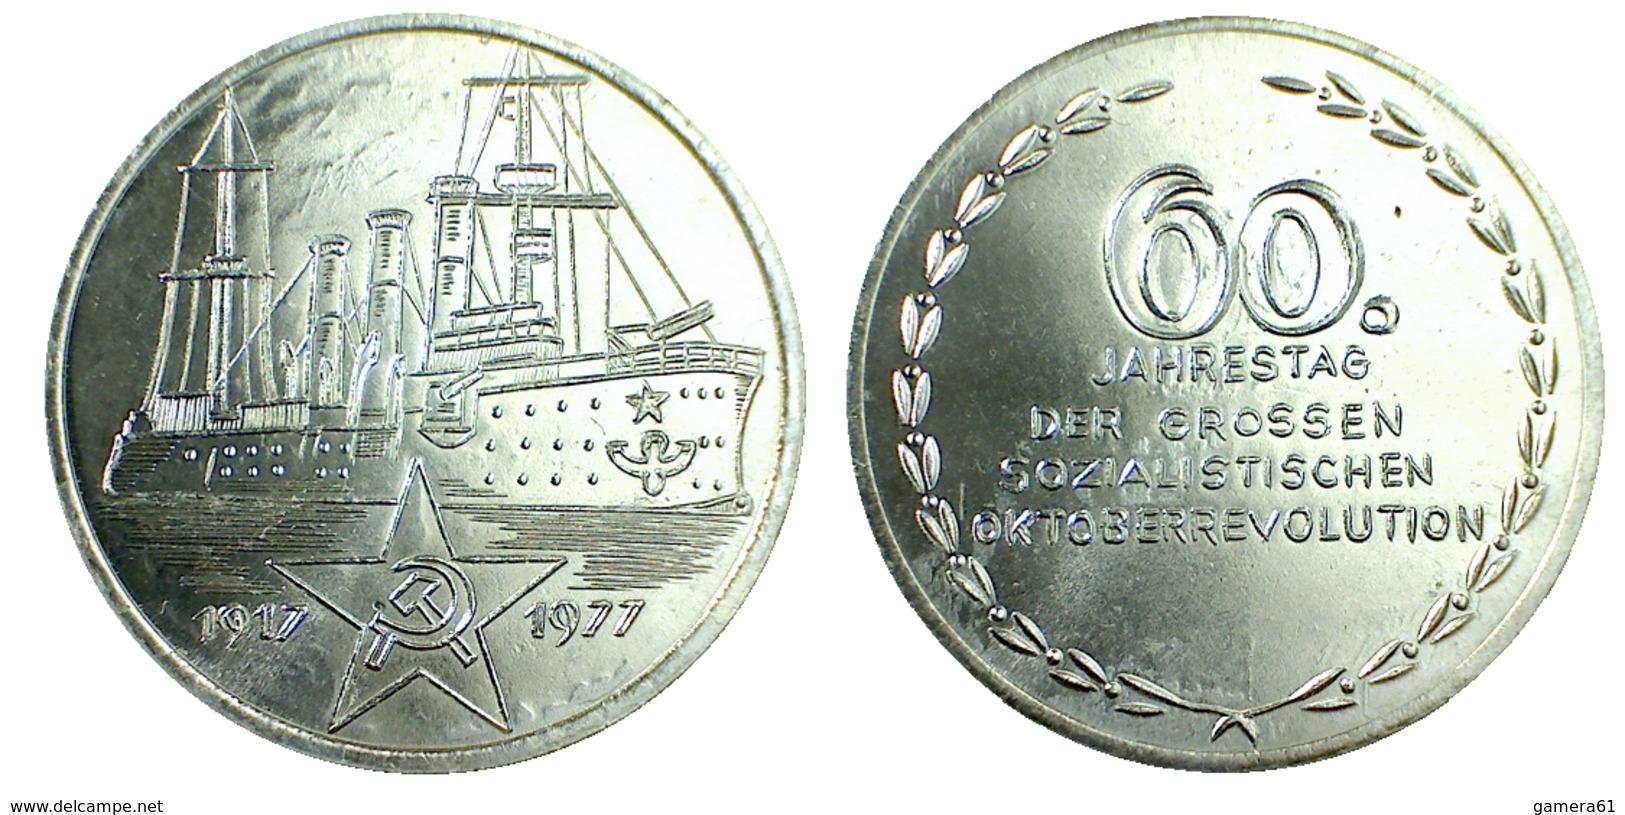 02889 MEDAGLIA MEDAL 60 JAHRESTAG DER GROSSE SOZIALKISTICHEN OKTOBER REVOLUTION 1917/1977 - Allemagne